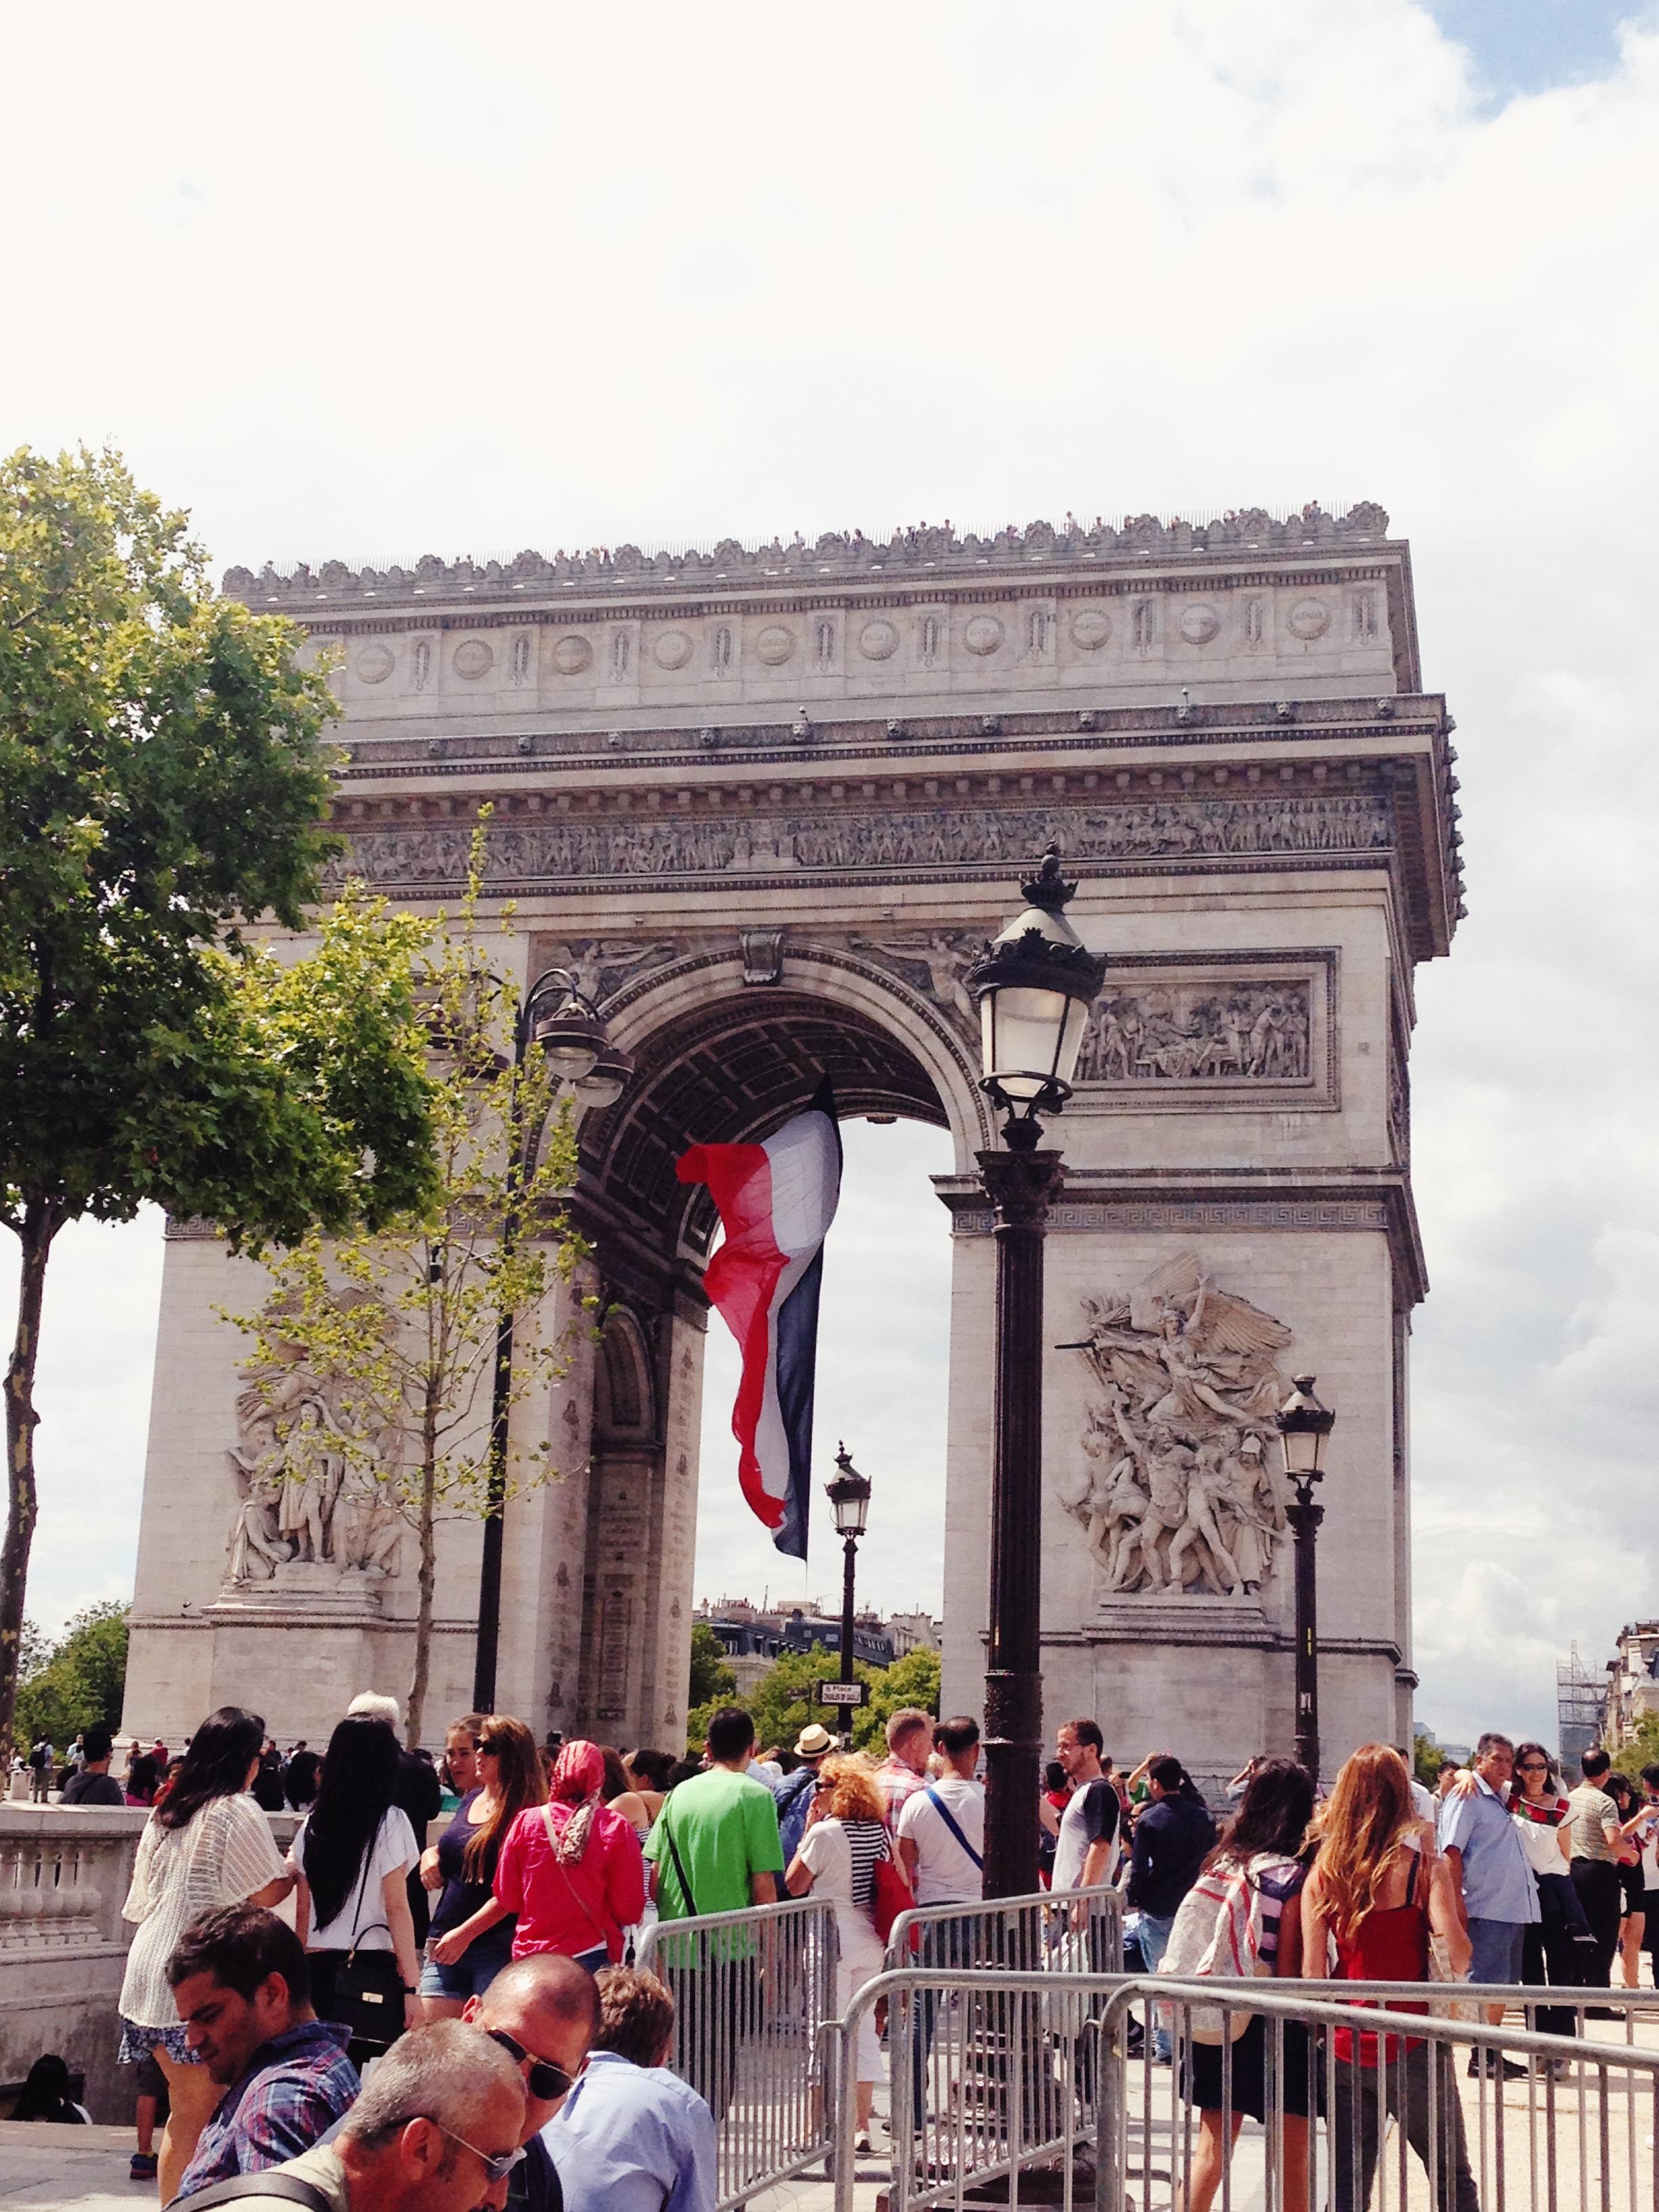 Culture Shock in Paris